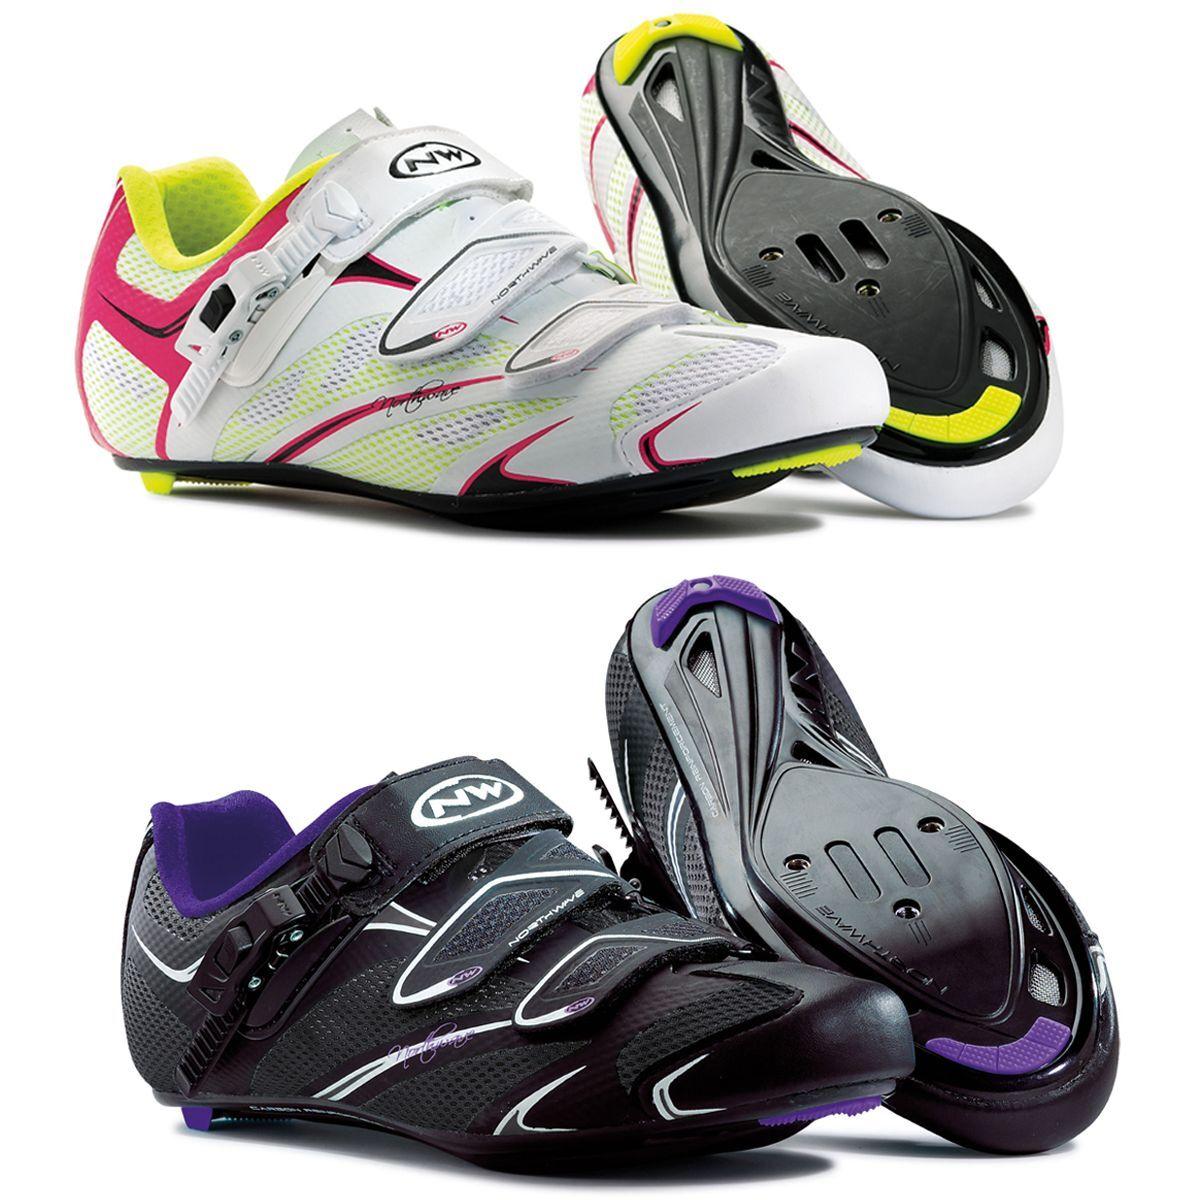 Northwave Starlight SRS para mujer carretera Ciclismo Zapatos Negro púrpuraa Y blancoo Fucsia